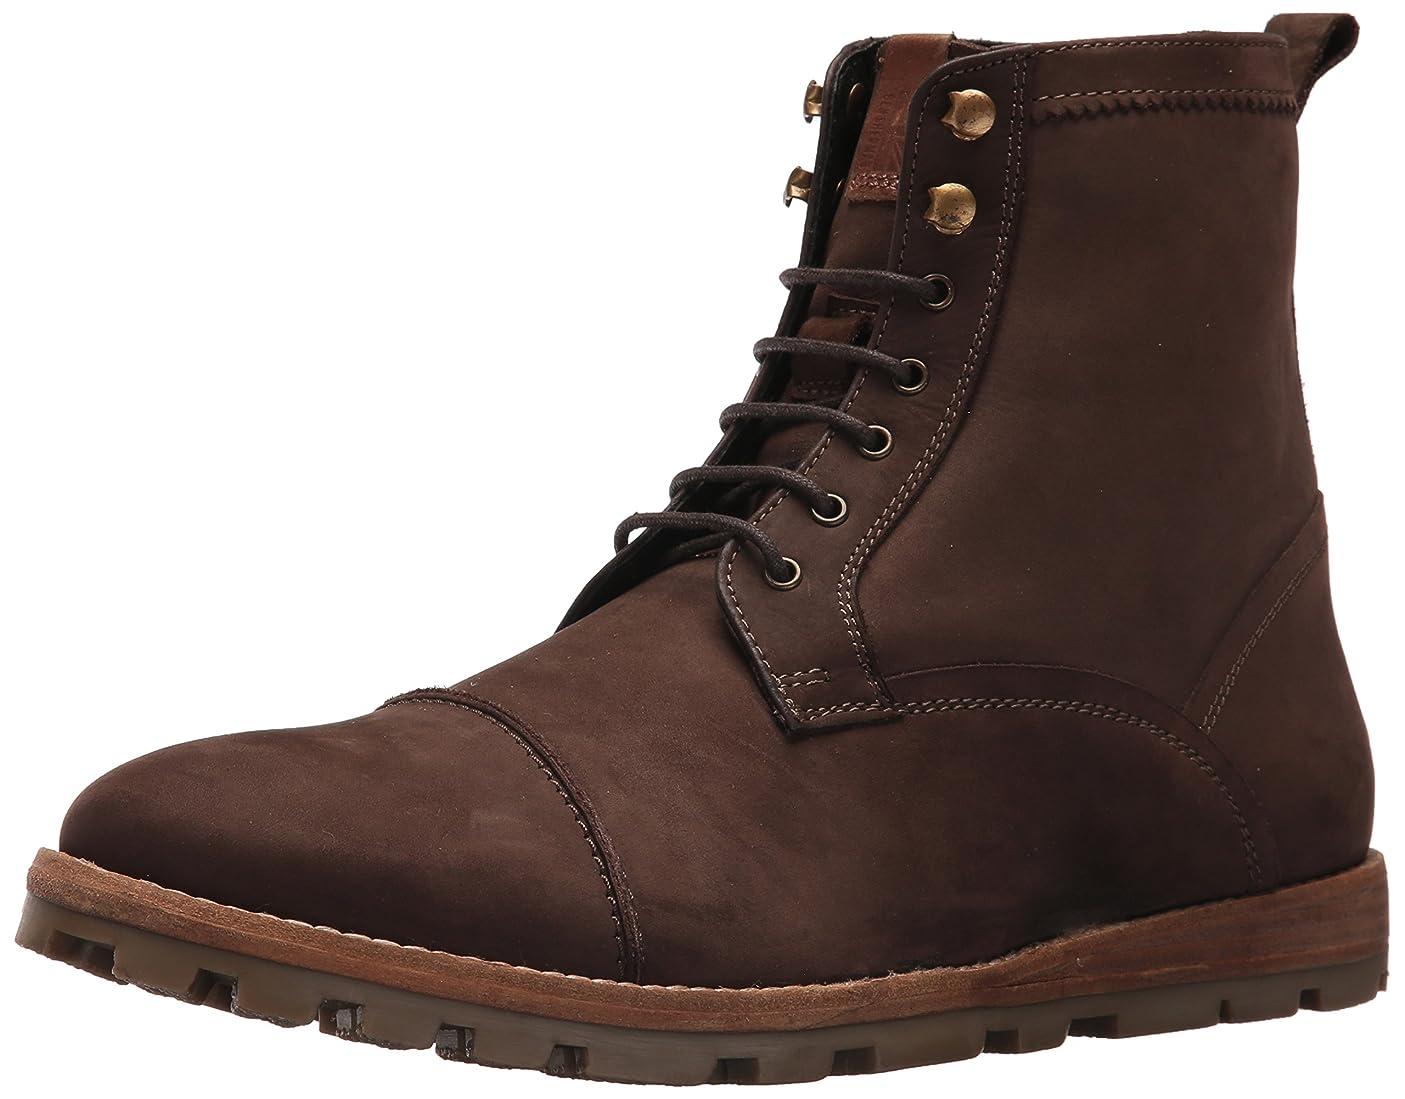 ee0110664c180 Ben Sherman Men's Andrew Tall Boot Fashion ekchjncvfcg975 ...